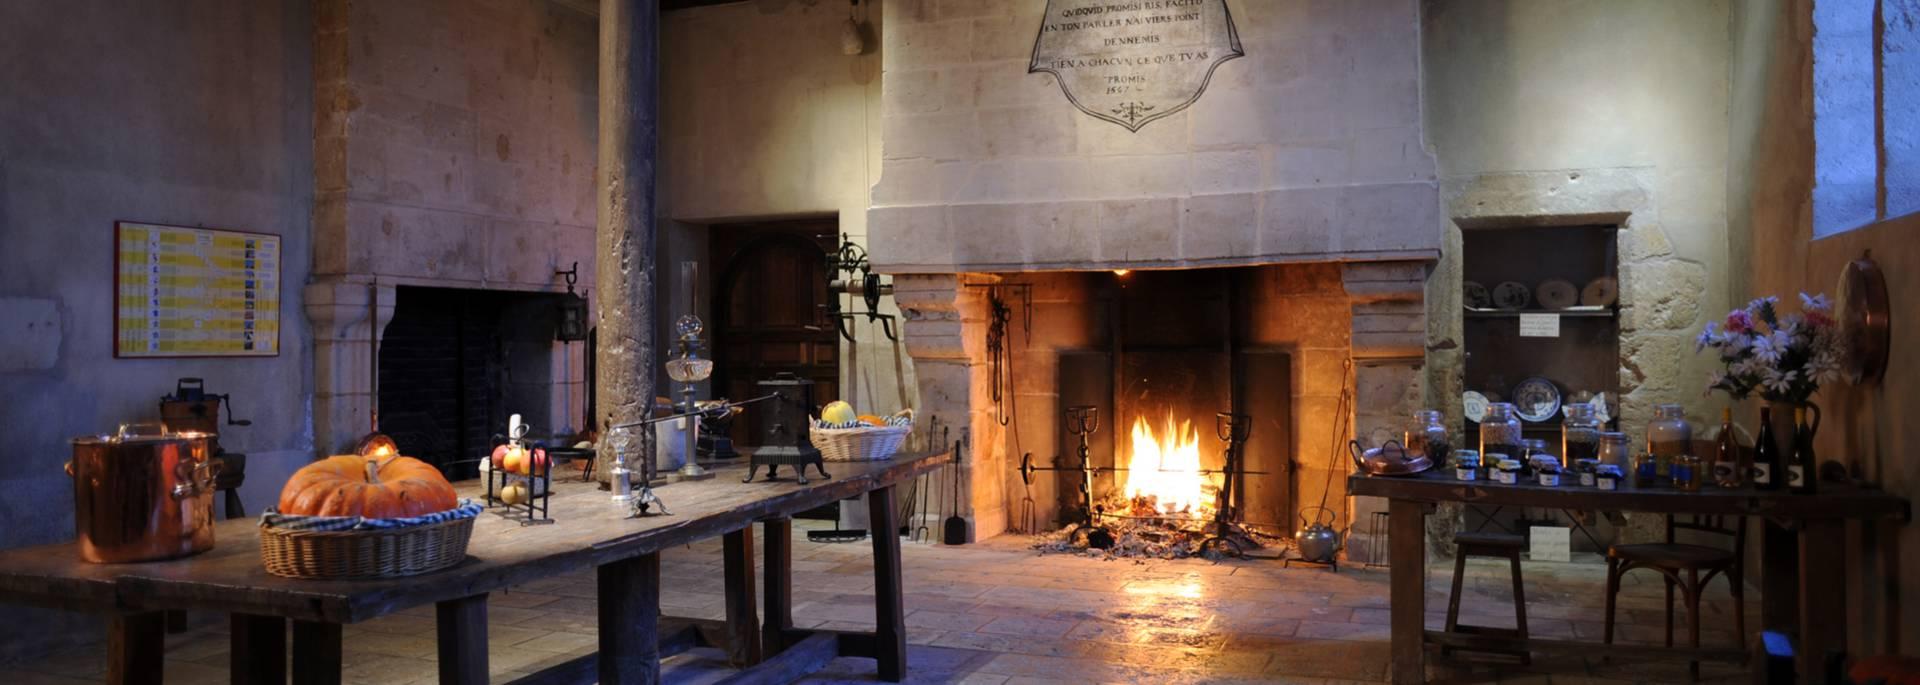 Feu de cheminée au château de Beauregard